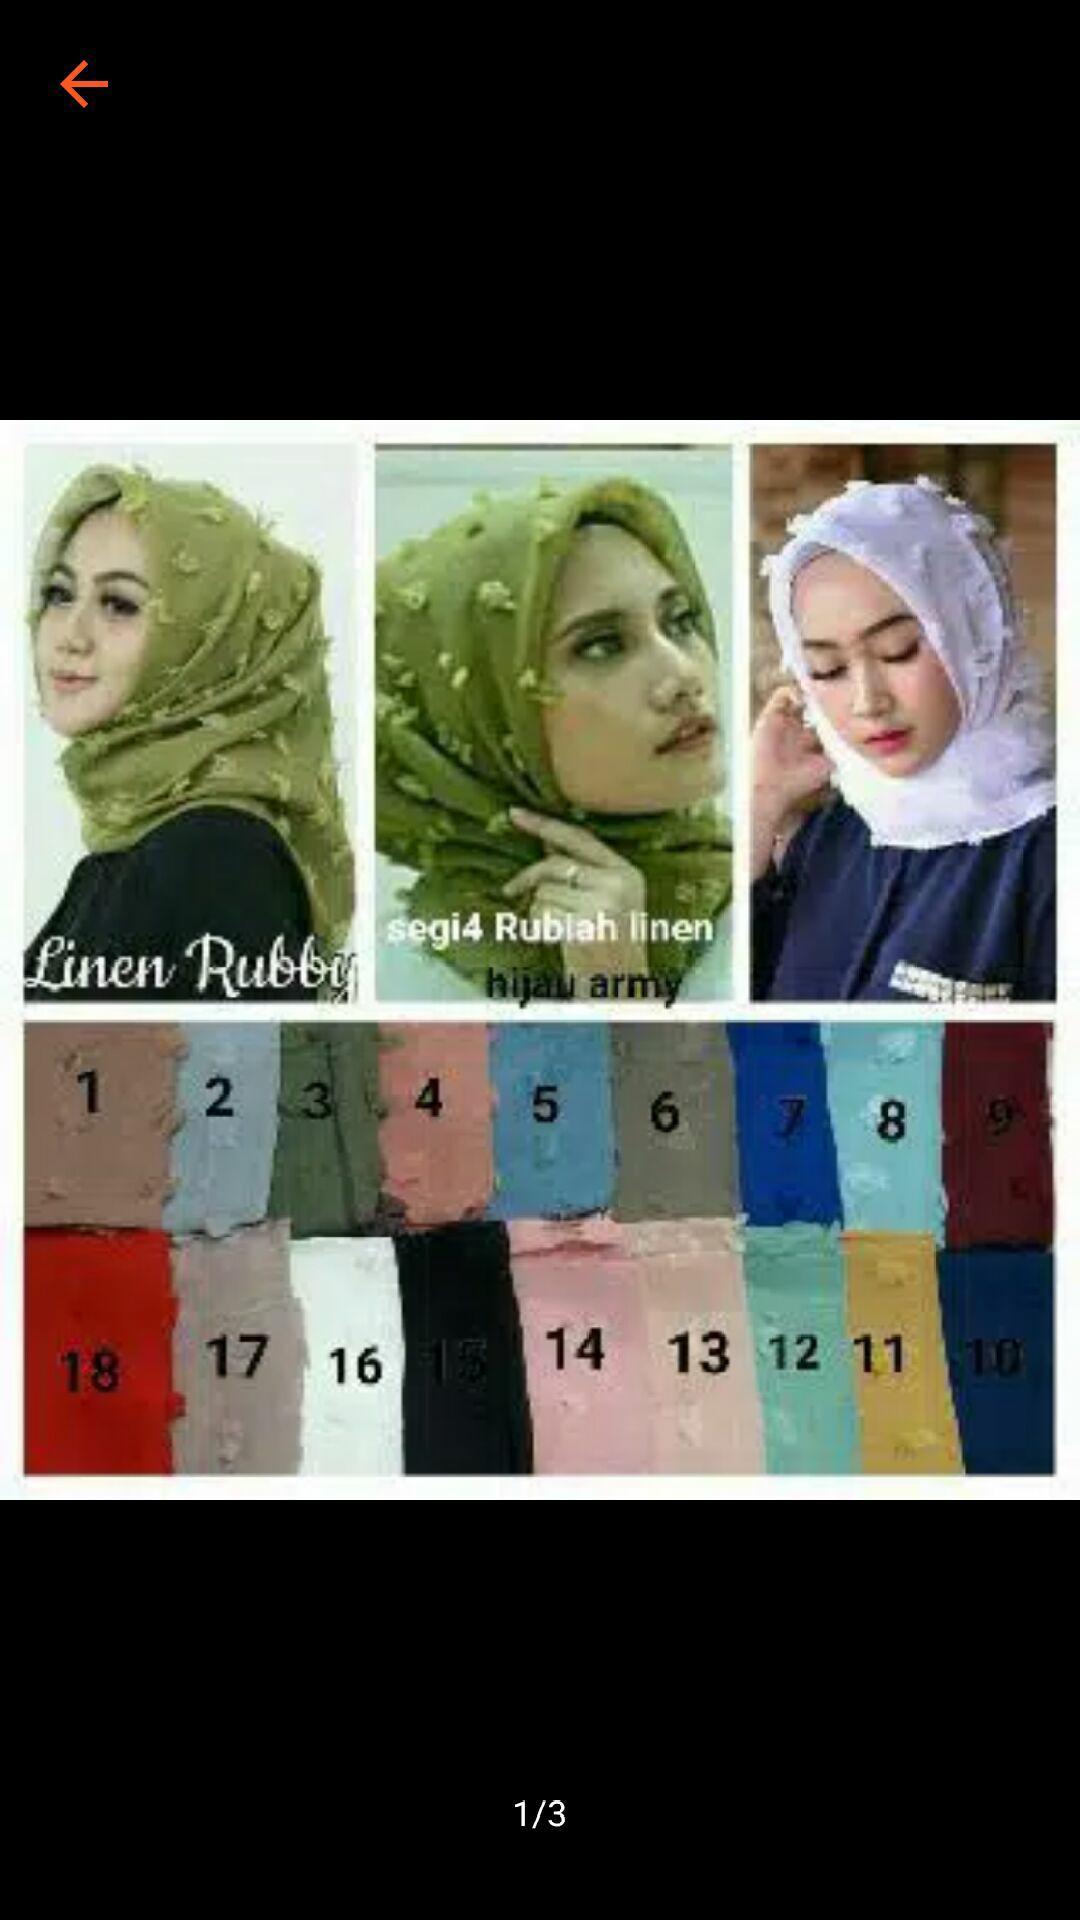 Mooie - hijab segiempat linen / jilbab bulu/ rubiah square /